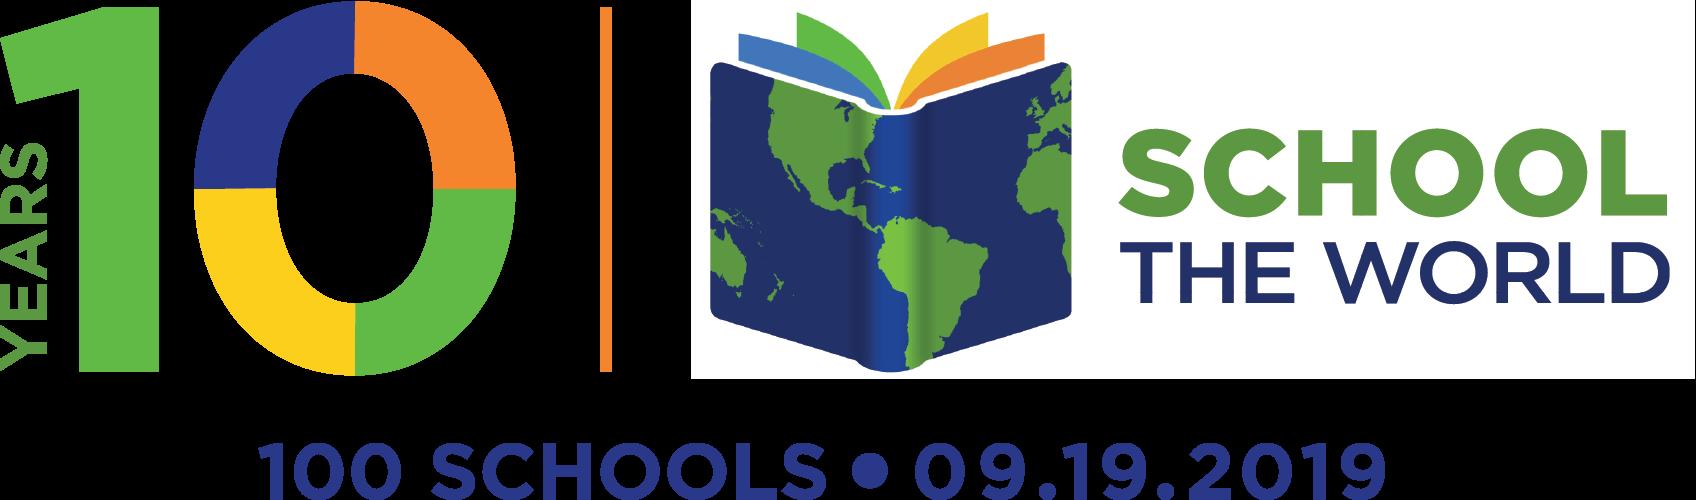 School of the World